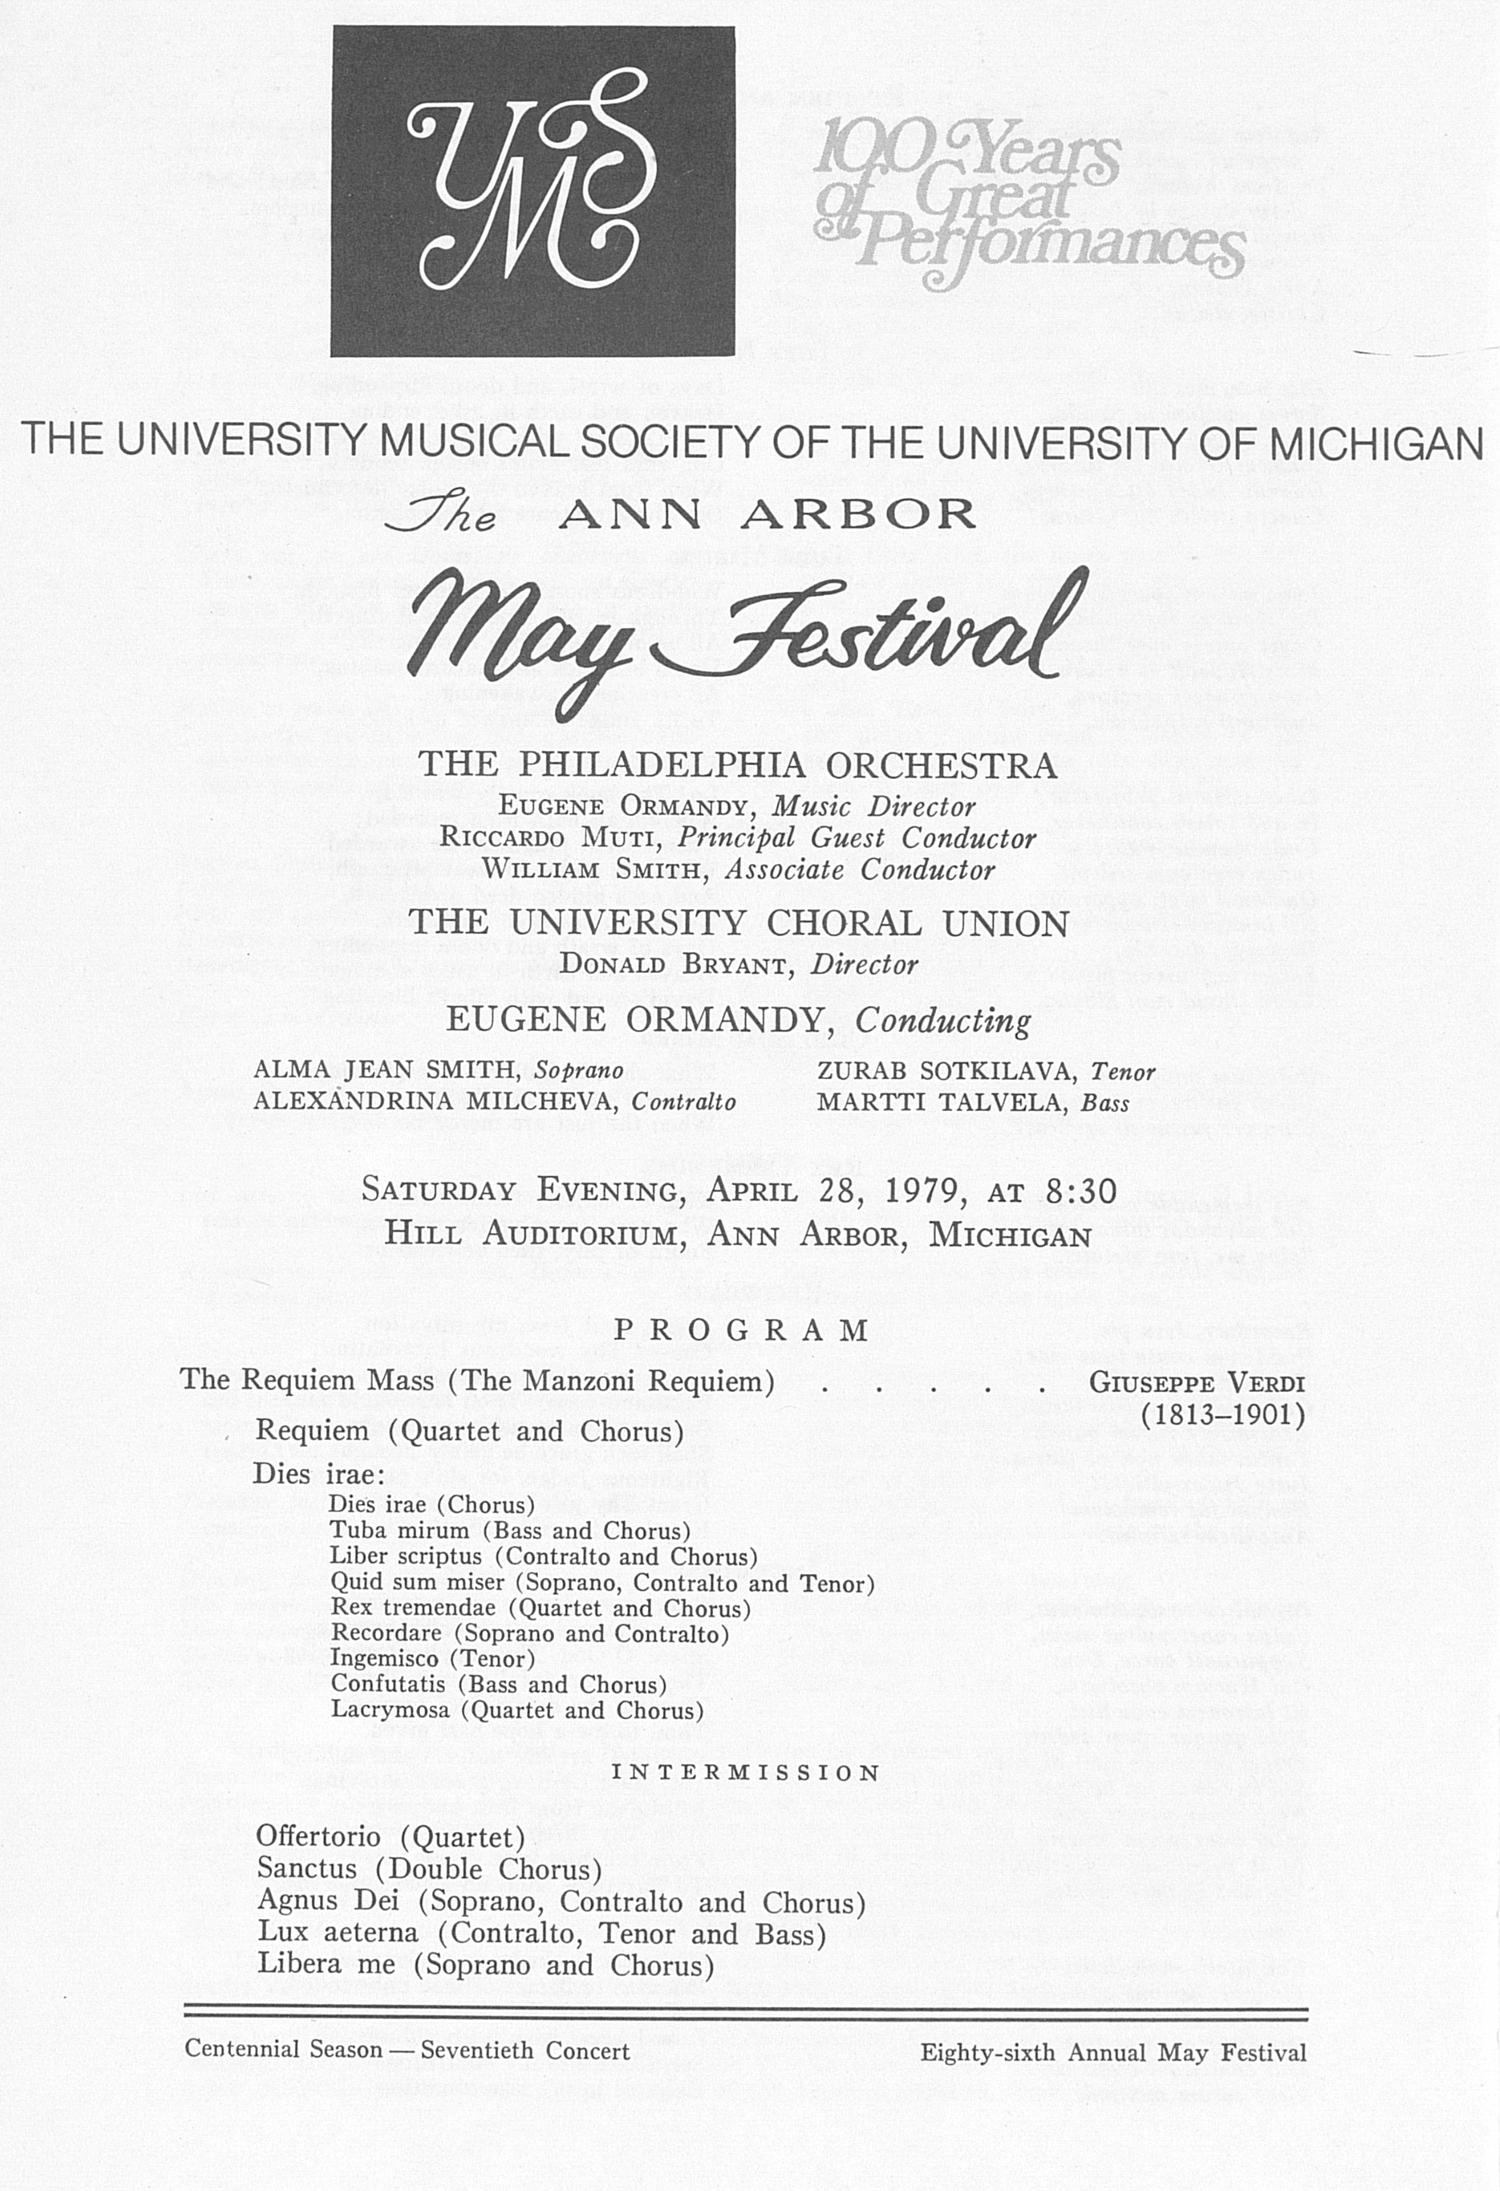 UMS Concert Program, April 28, 1979: The Ann Arbor May